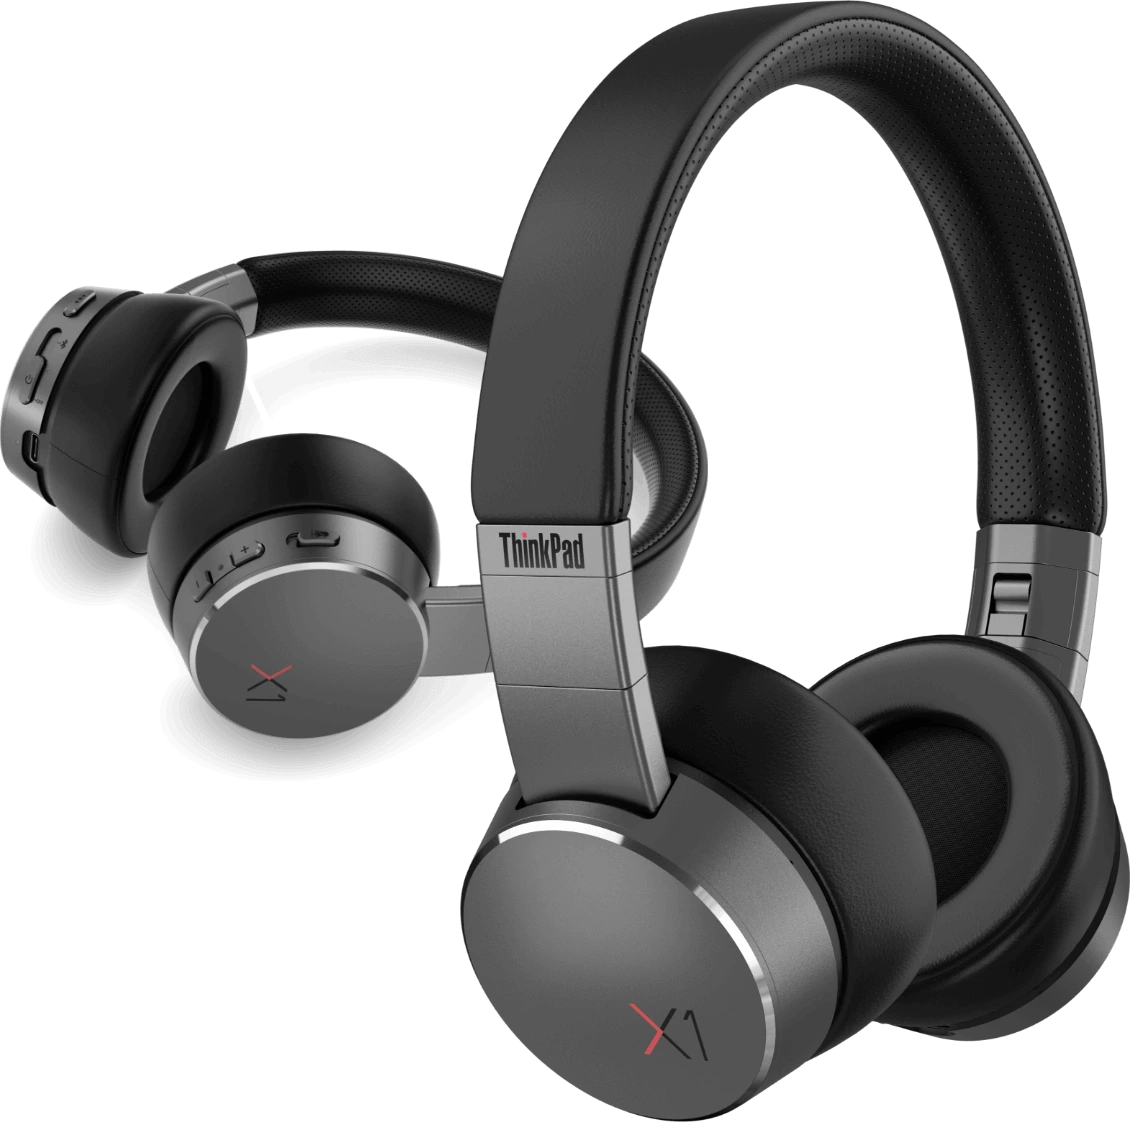 Lenovo ThinkPad X1 ANC headphones closeup view